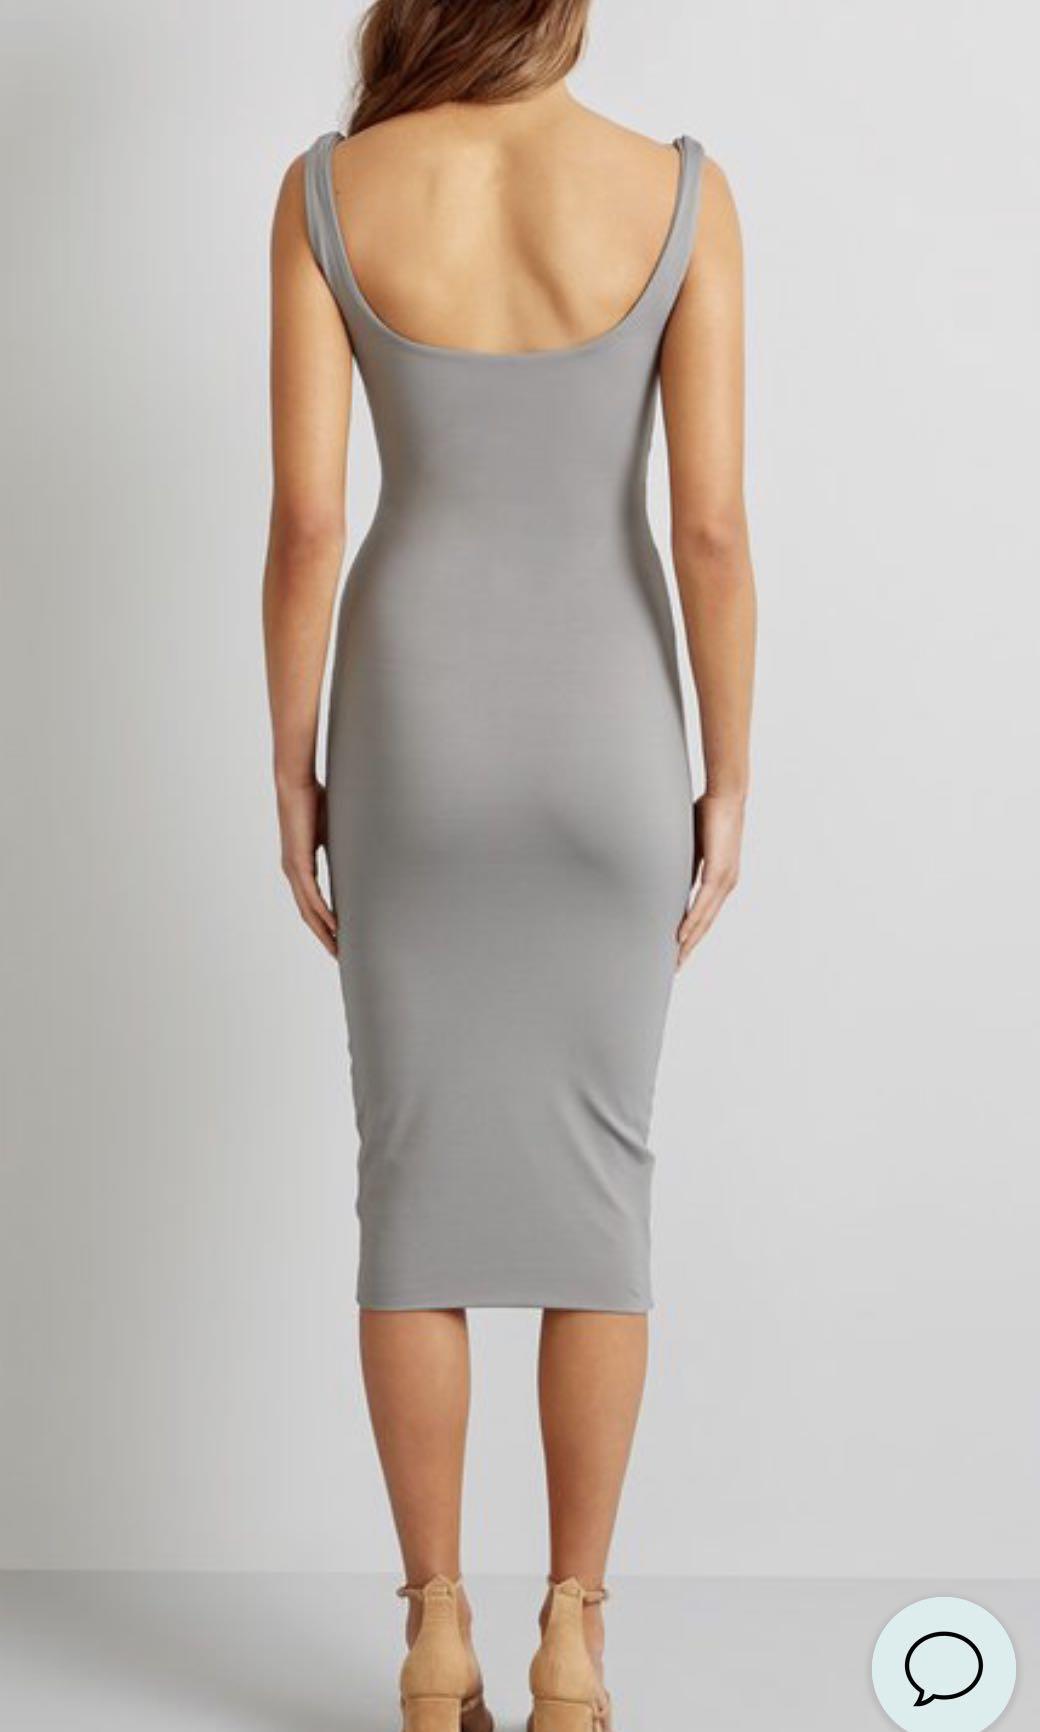 Kookai Nantes Midi Dress Olive Size 1 (fits au 6-8)